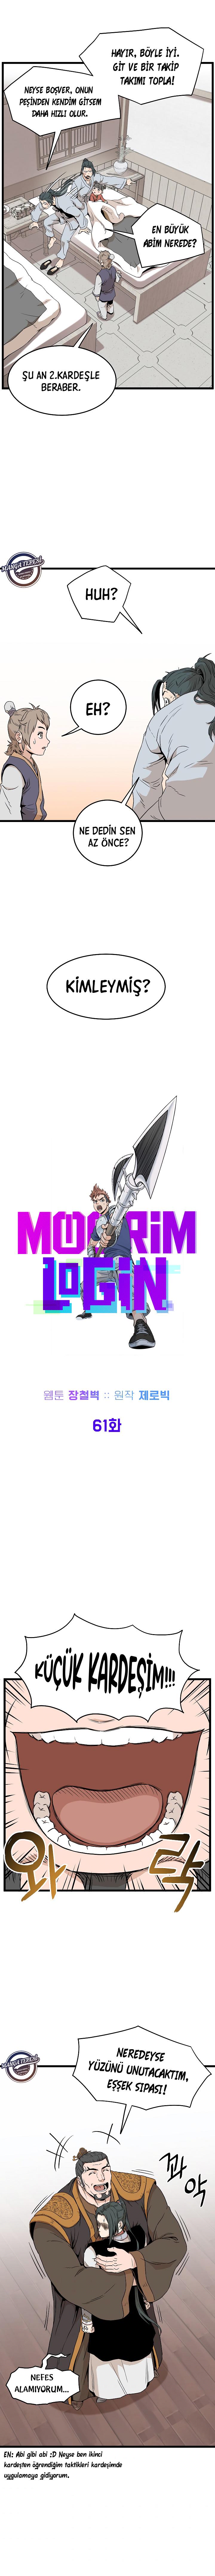 murim-login61-bolum